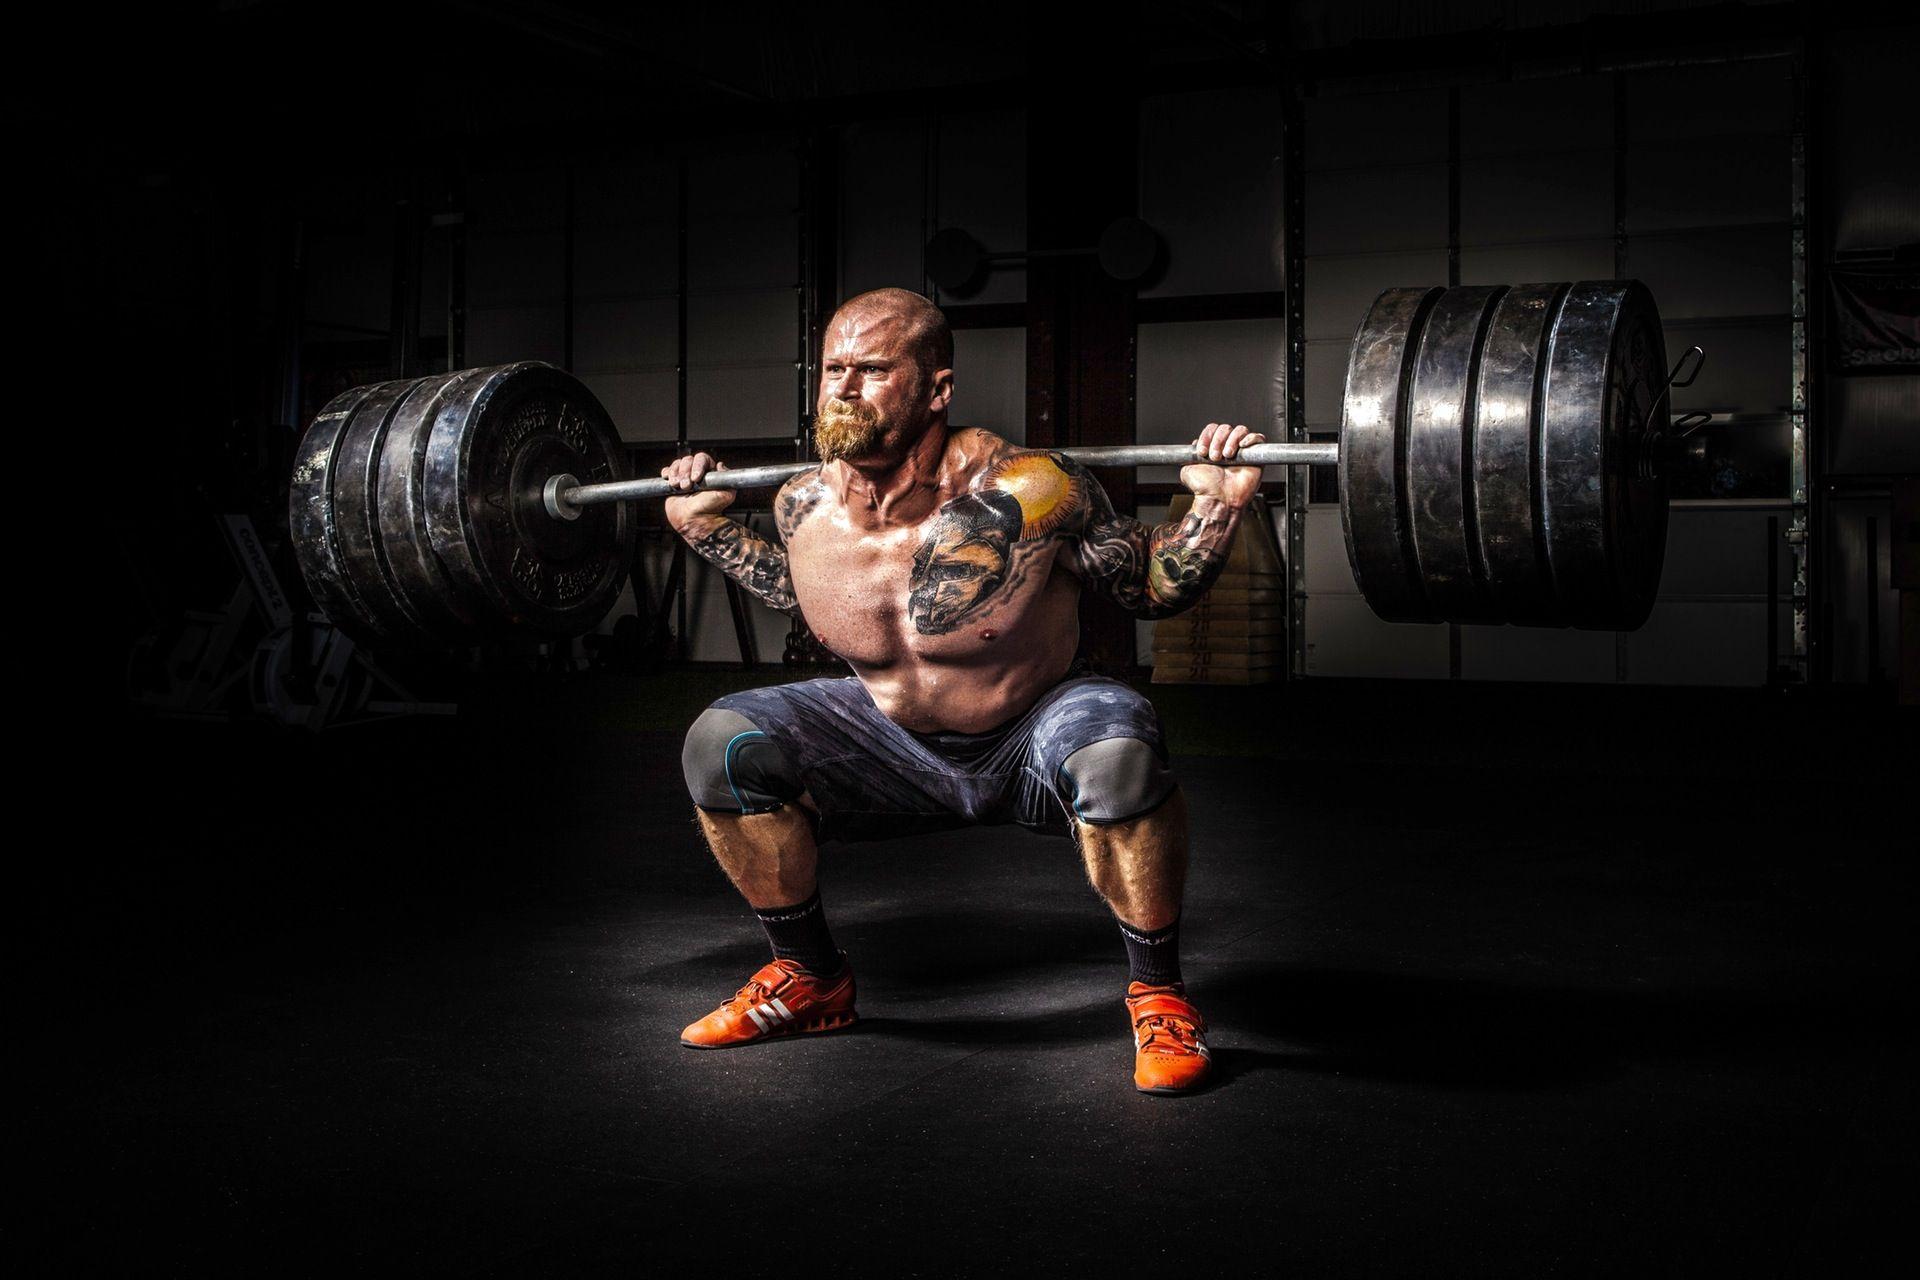 Как накачать мышцы — правила набора массы